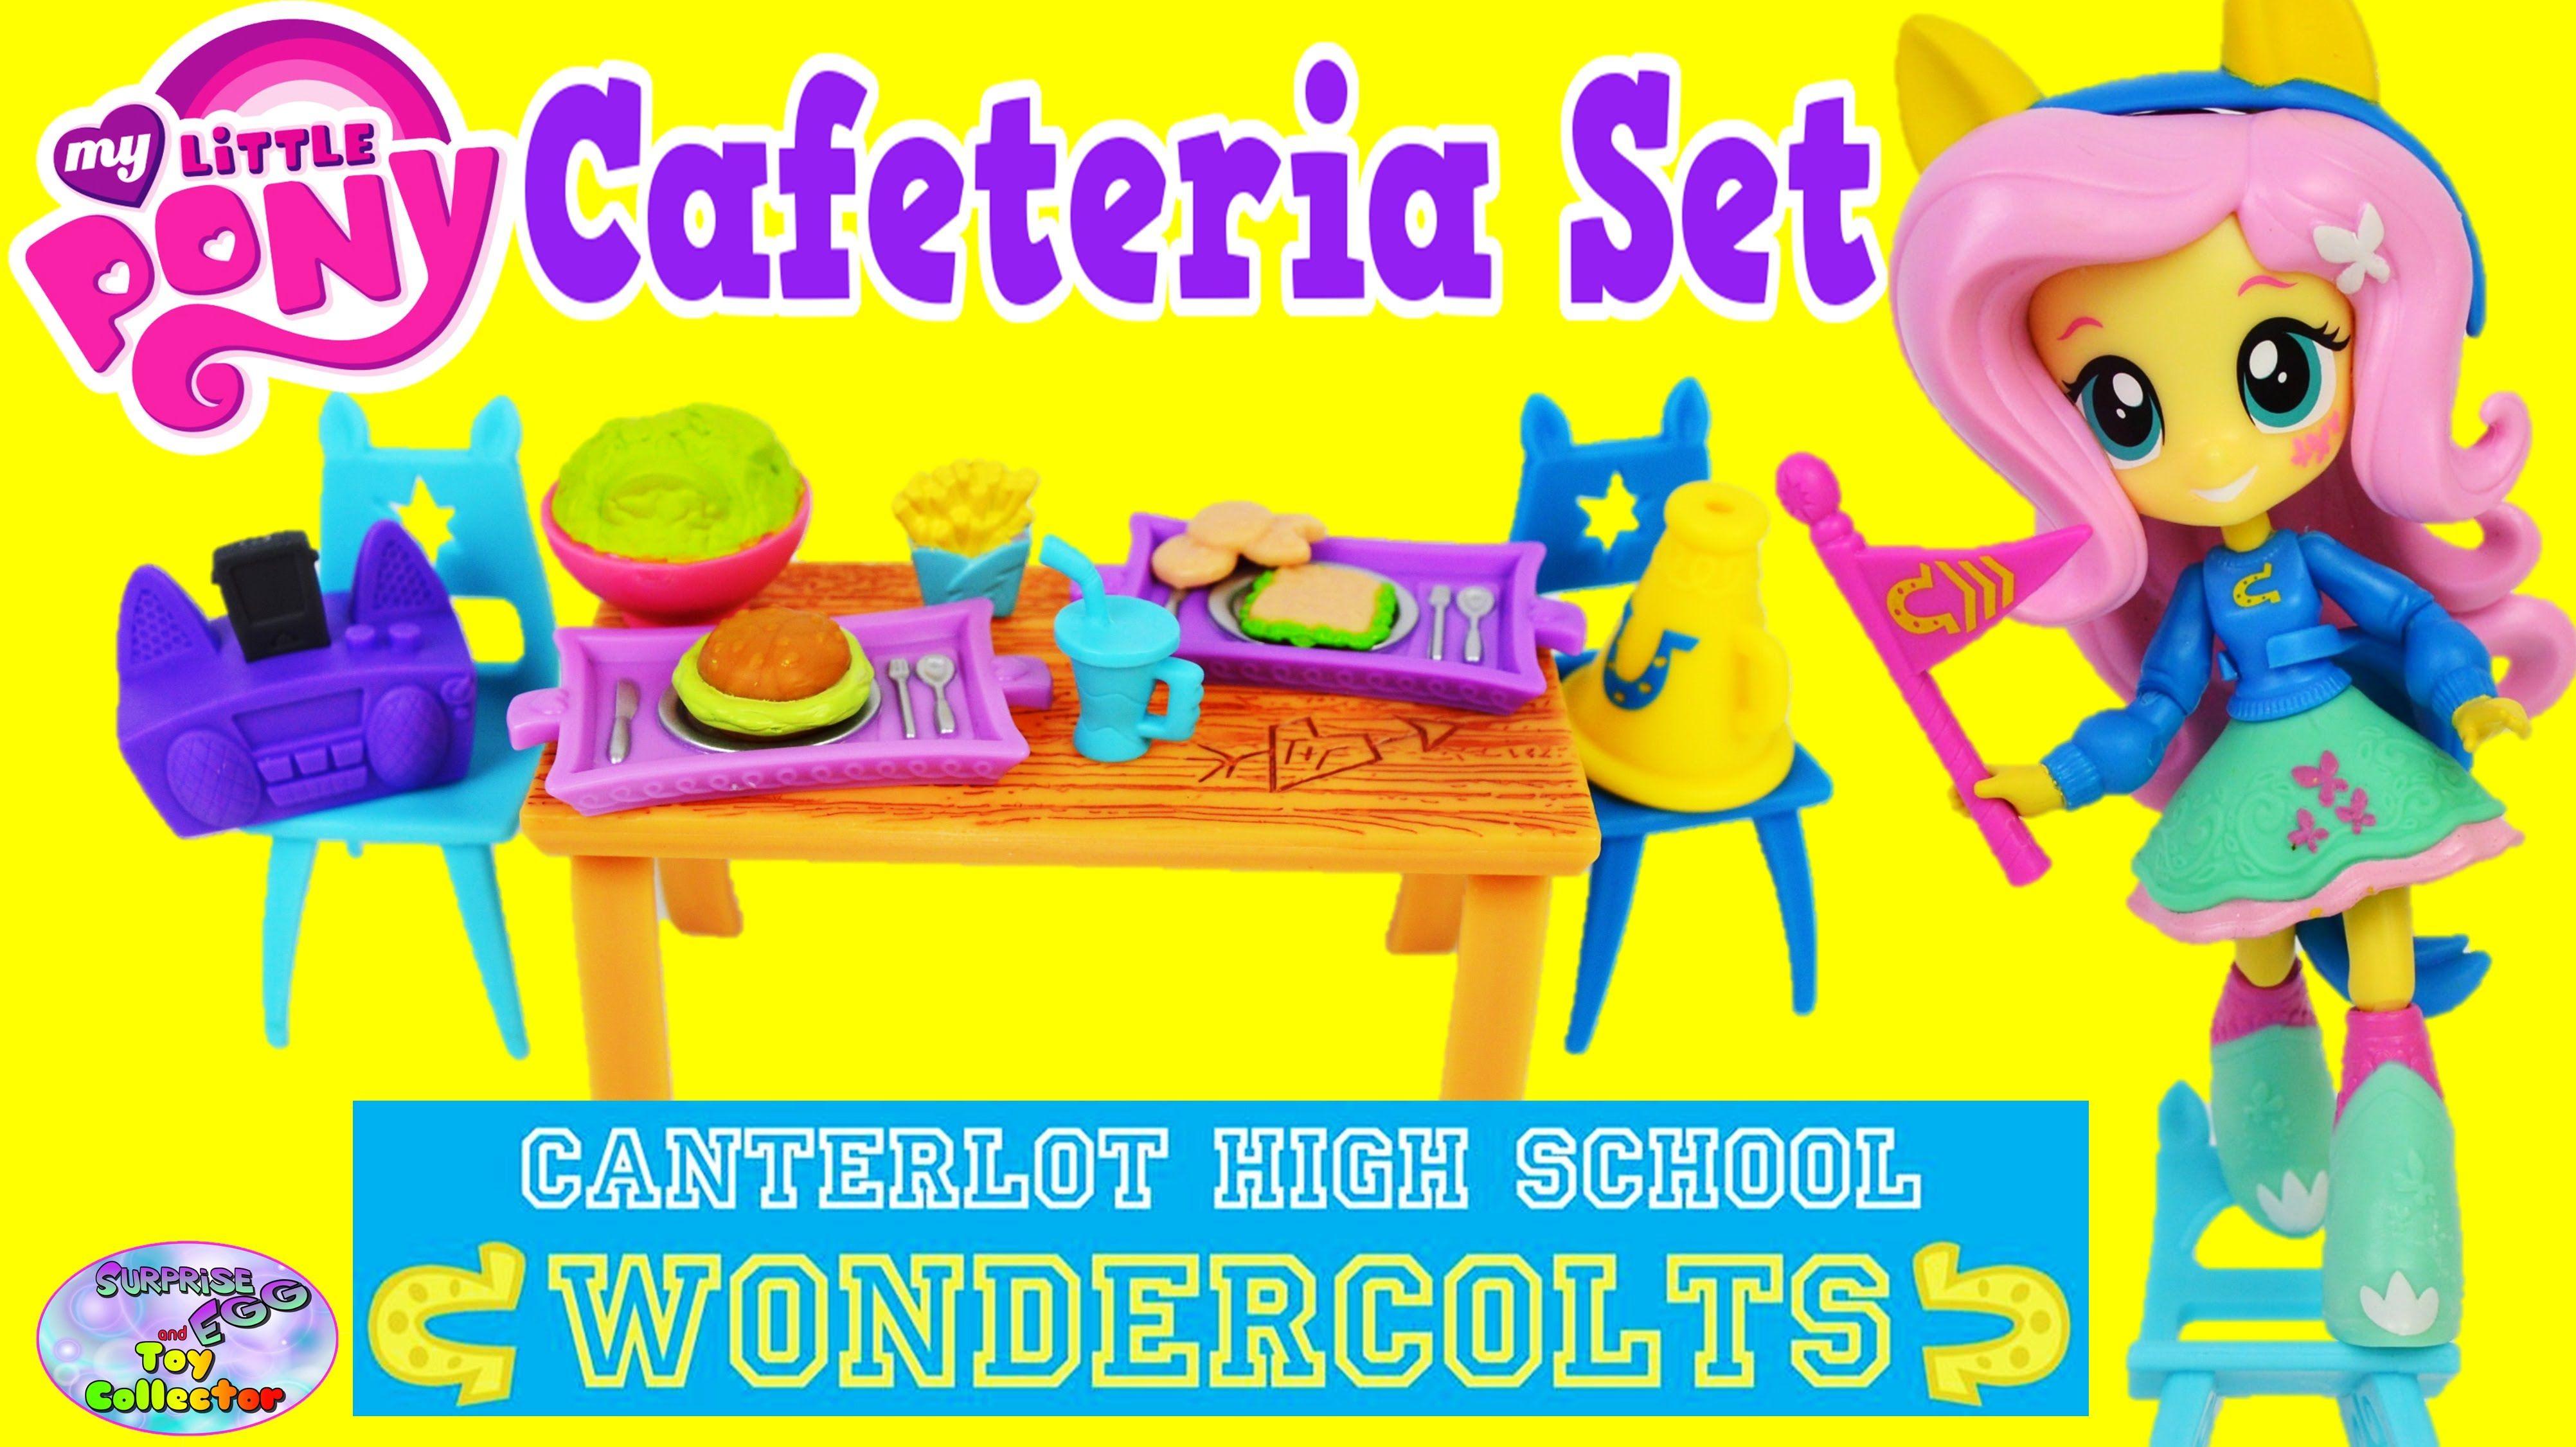 My Little Pony Equestria Girls Minis Cafeteria Set Fluttershy Surprise E...